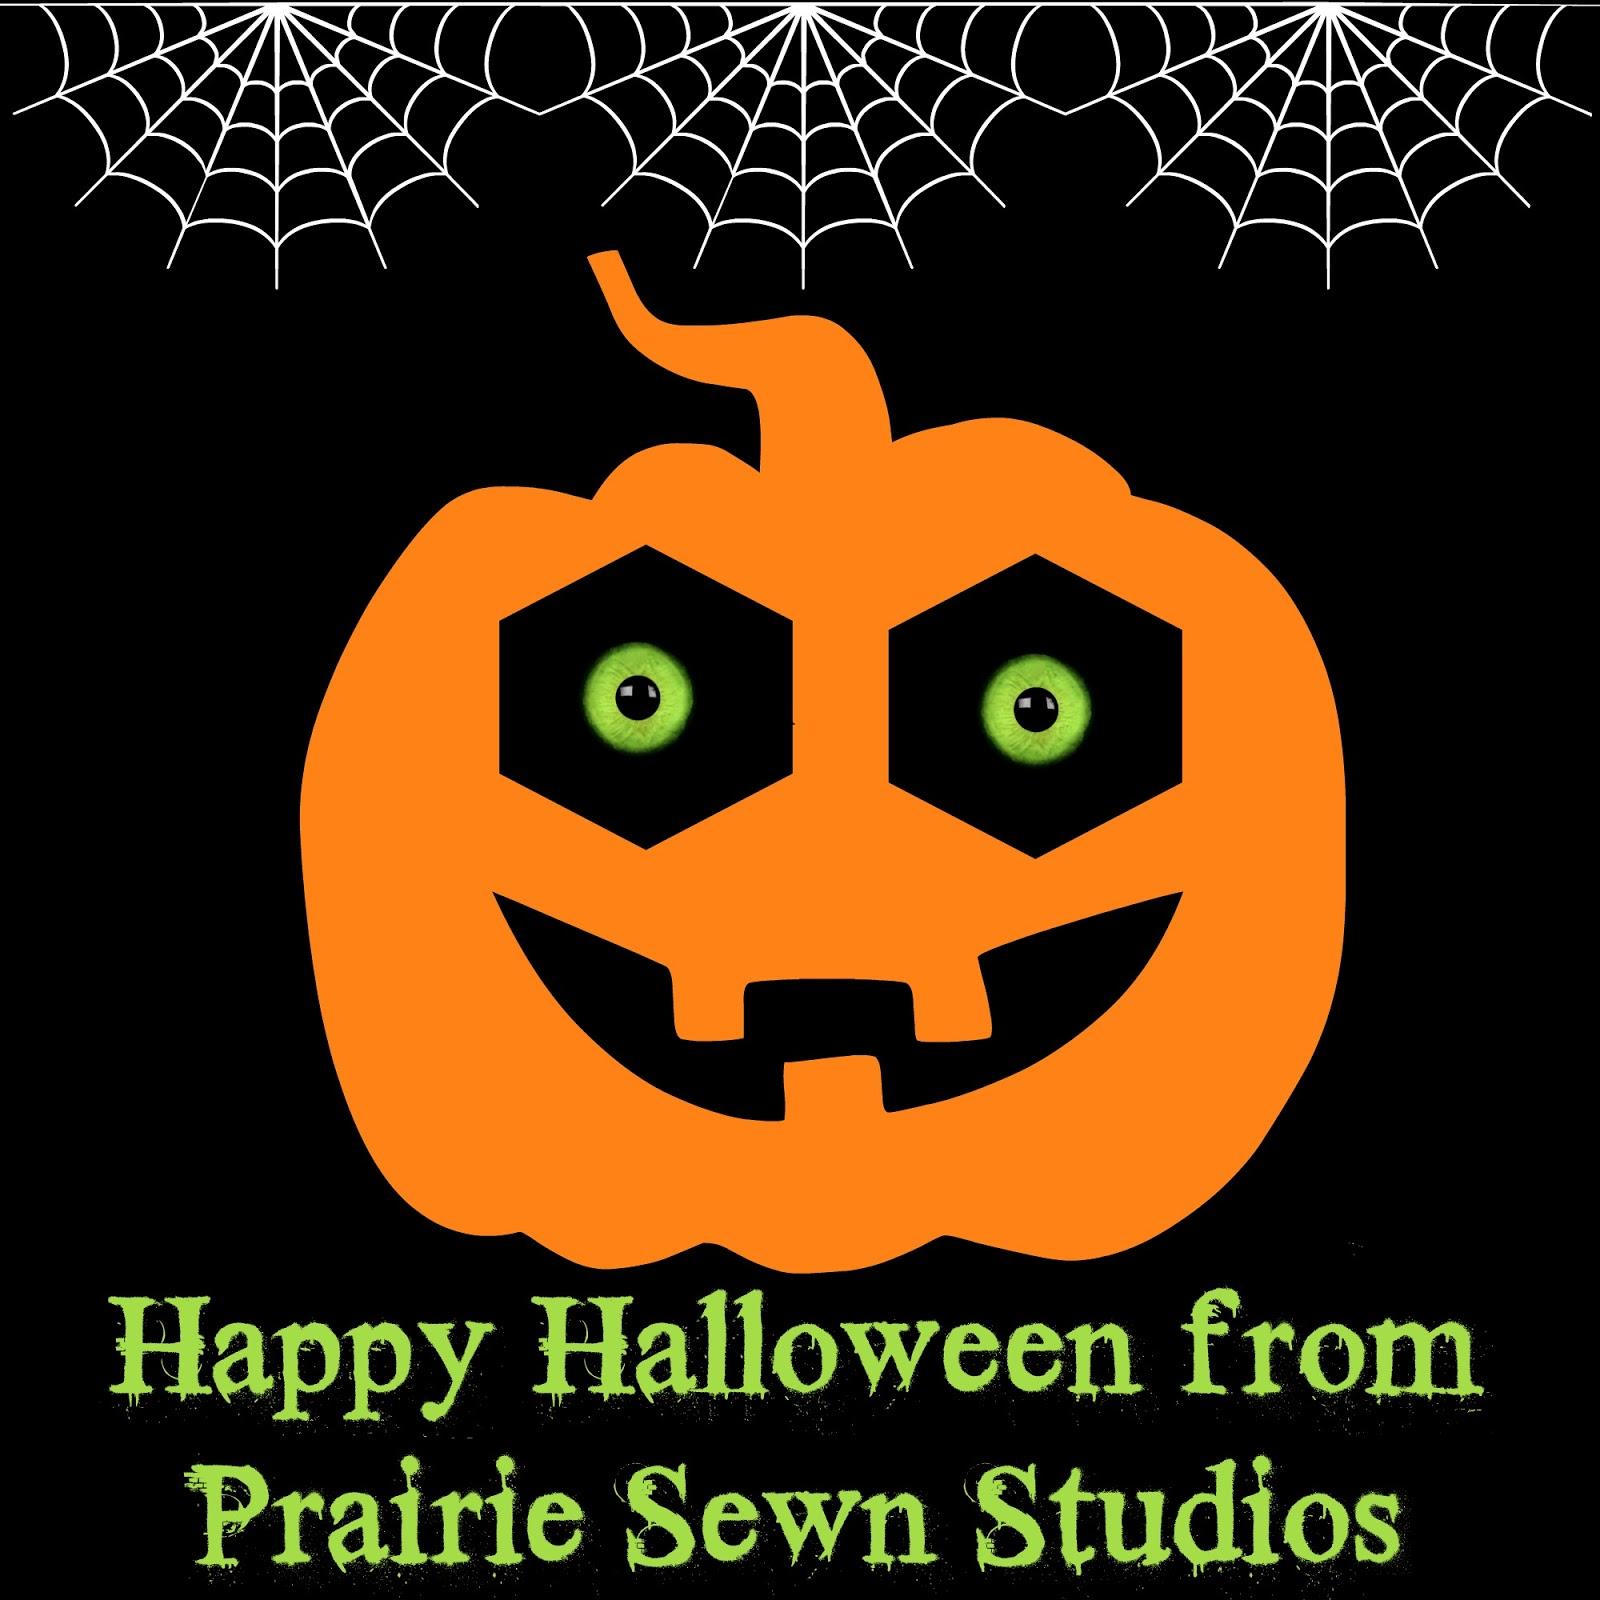 Happy Halloween from Prairie Sewn Studios